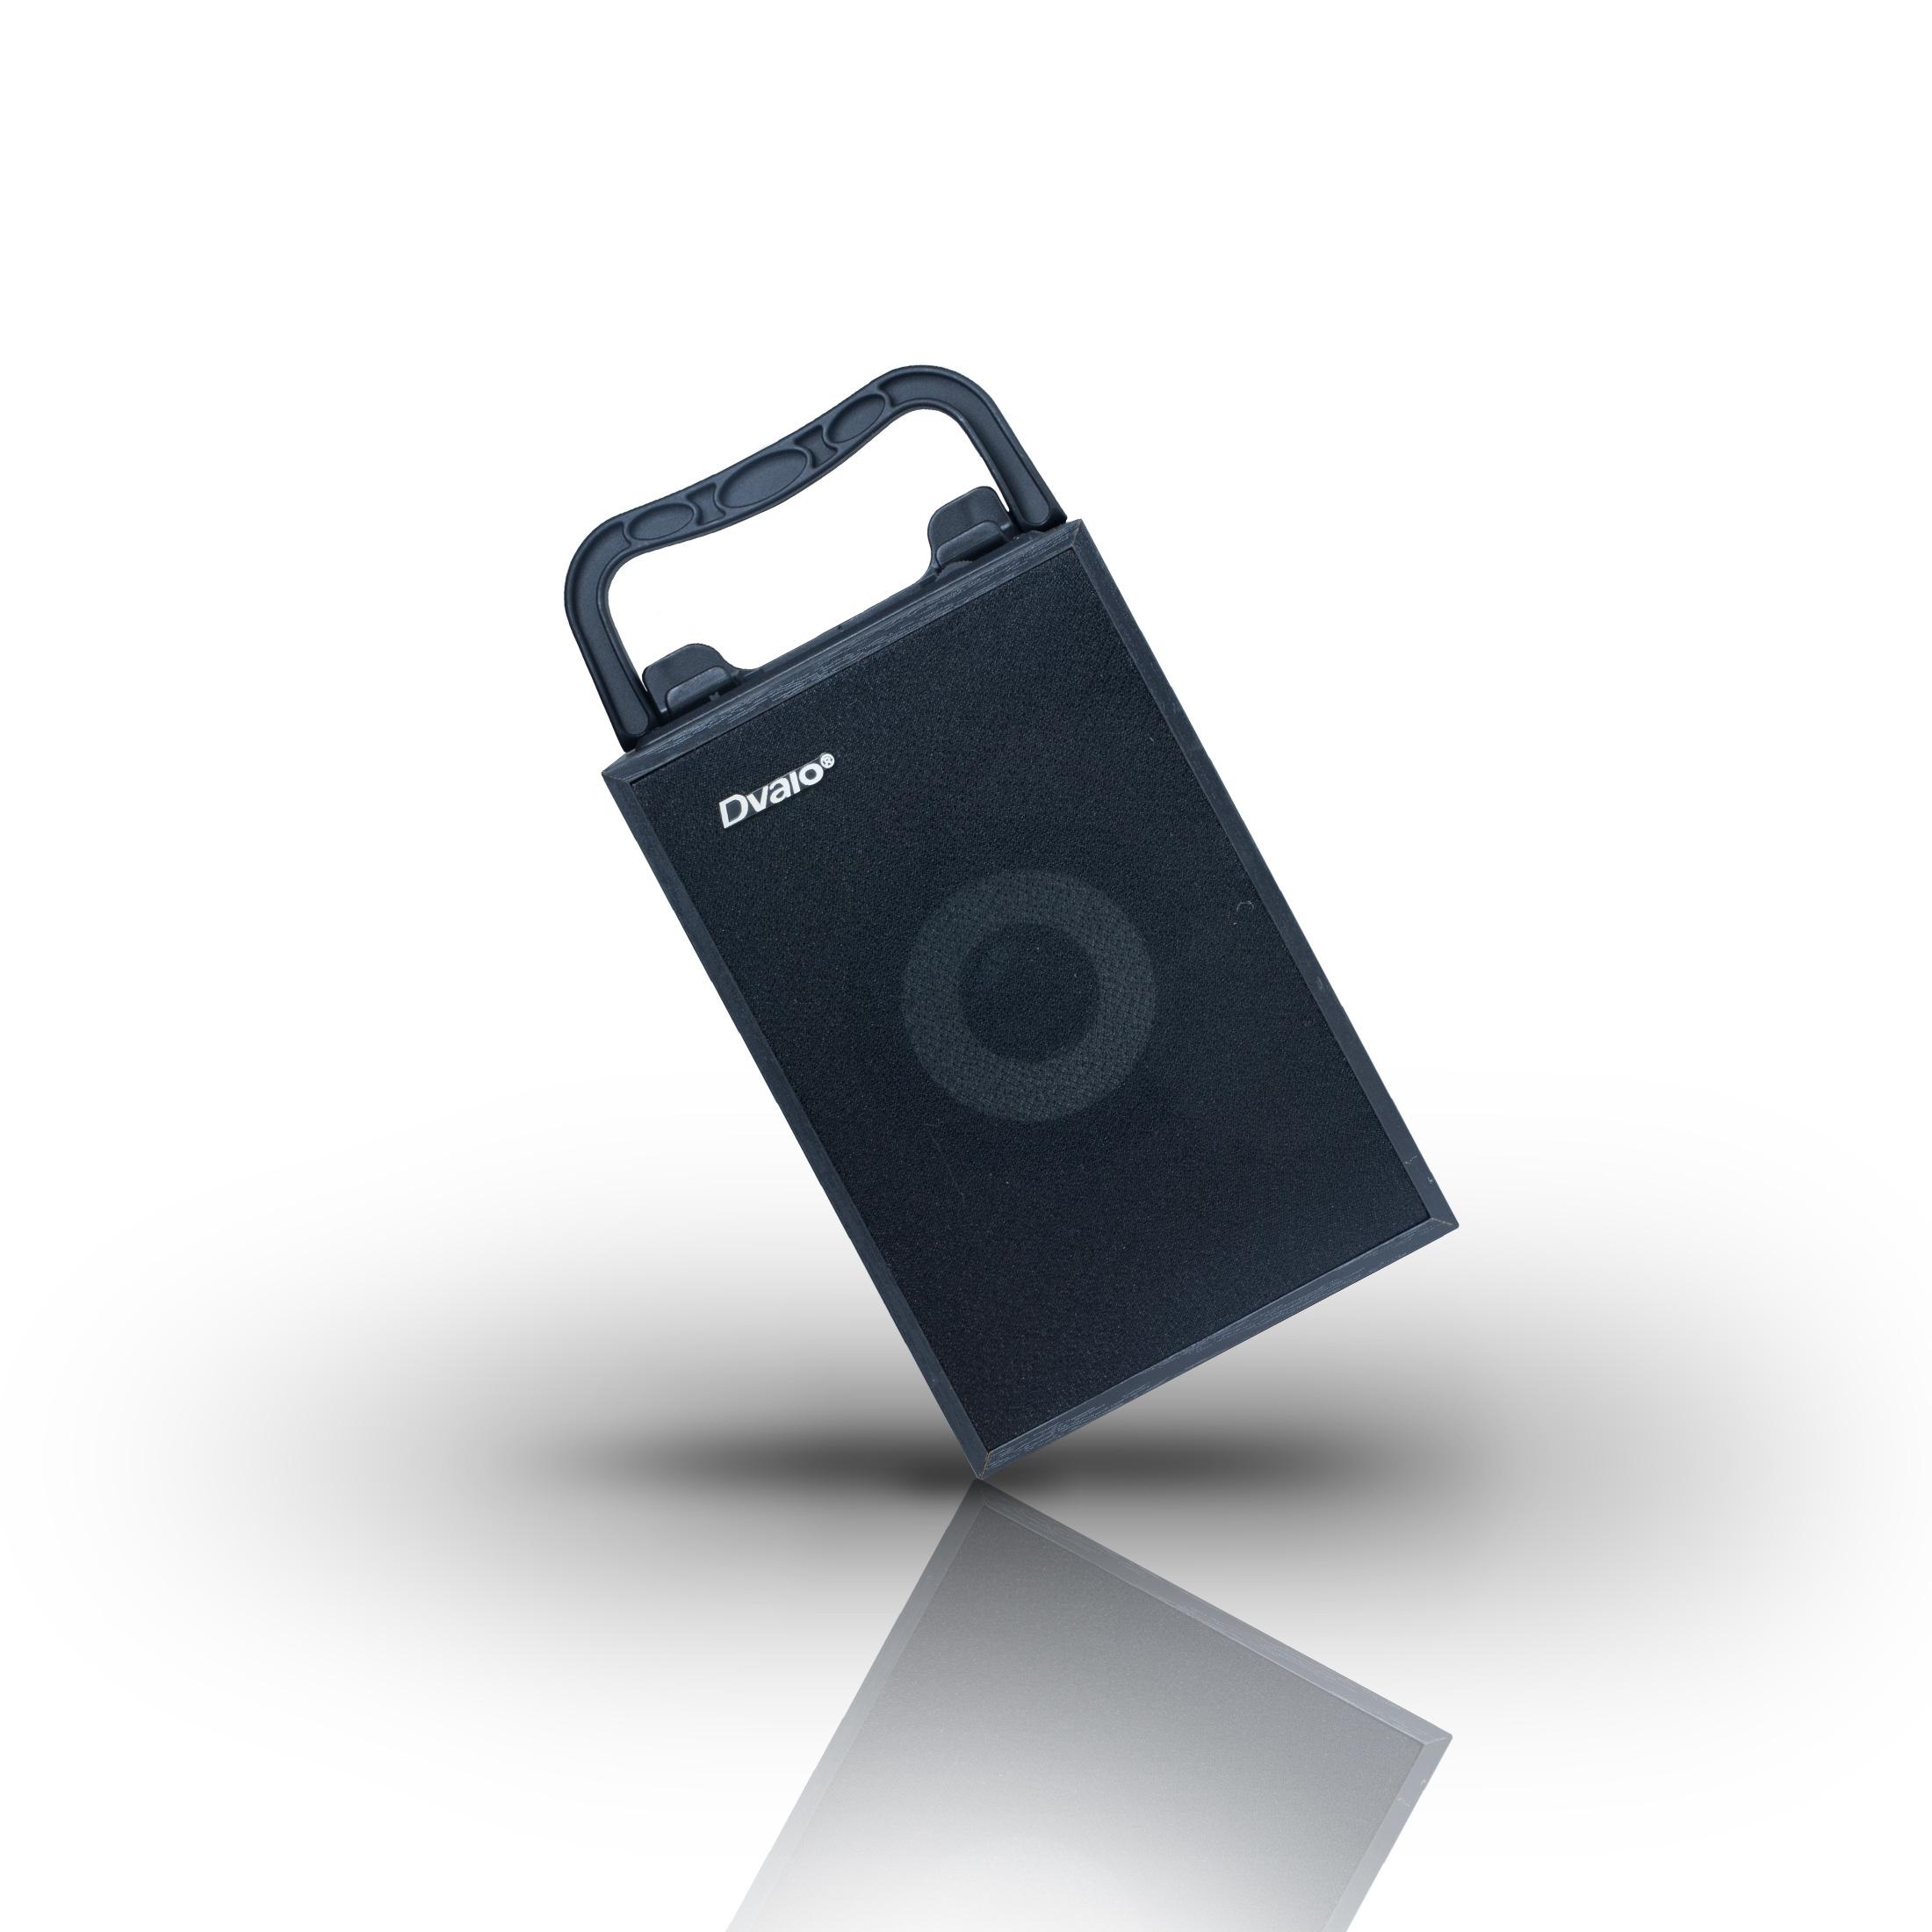 Dvaio S800 Wooden Portable  Wireless Speaker